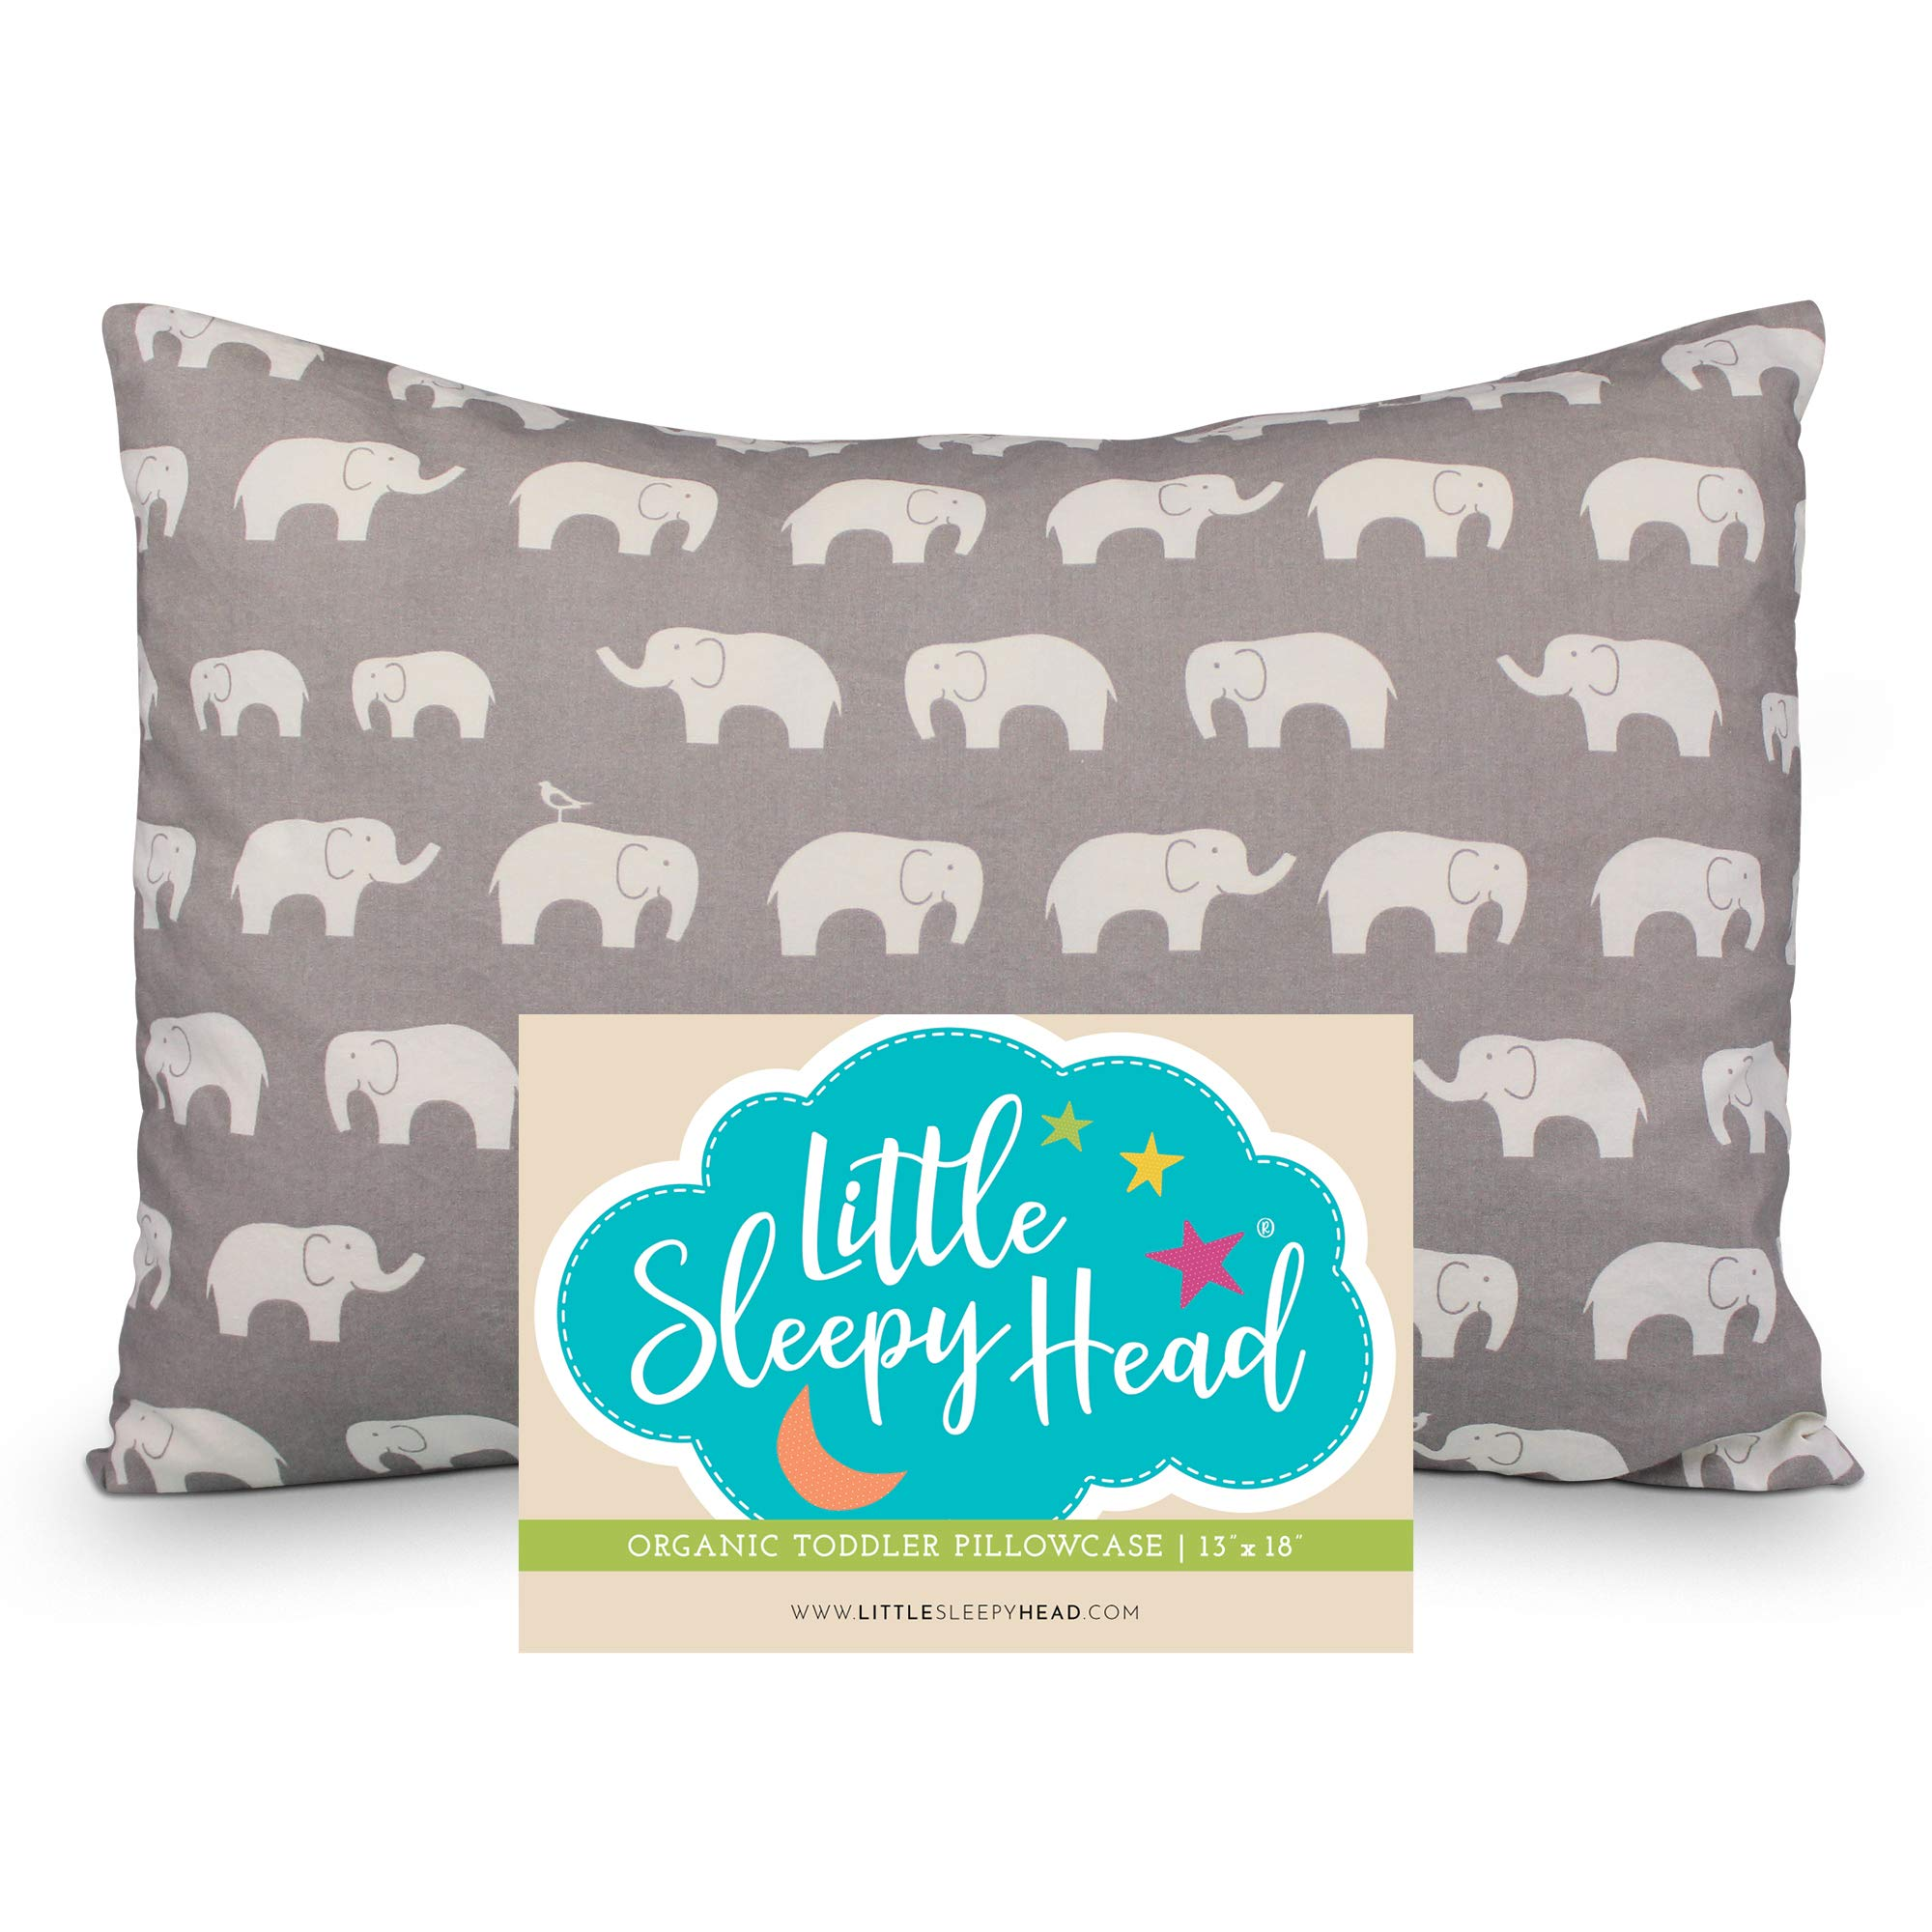 Little Sleepy Head Toddler Pillowcase 13x18-100% Organic Cotton & Hypoallergenic - Happy Elephants by Little Sleepy Head